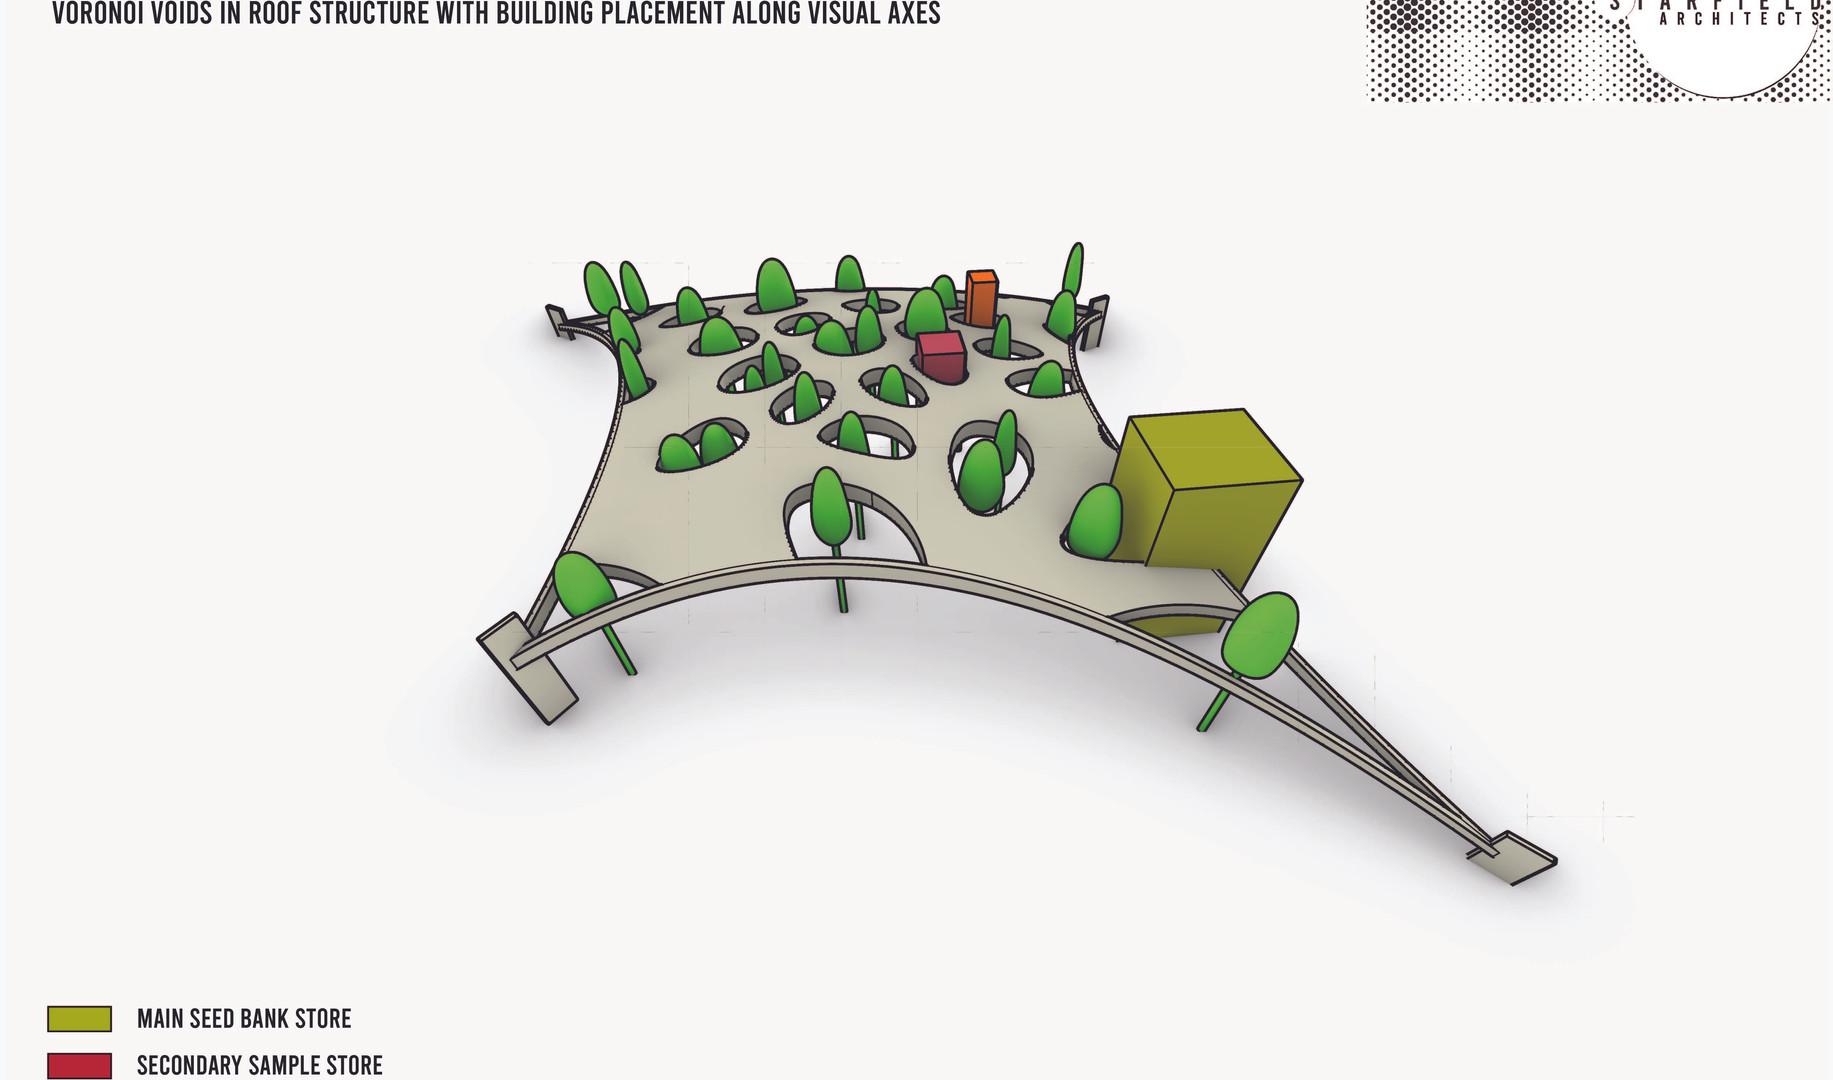 UNESCO_2020_Voronoi Seed Bank_2D.jpg